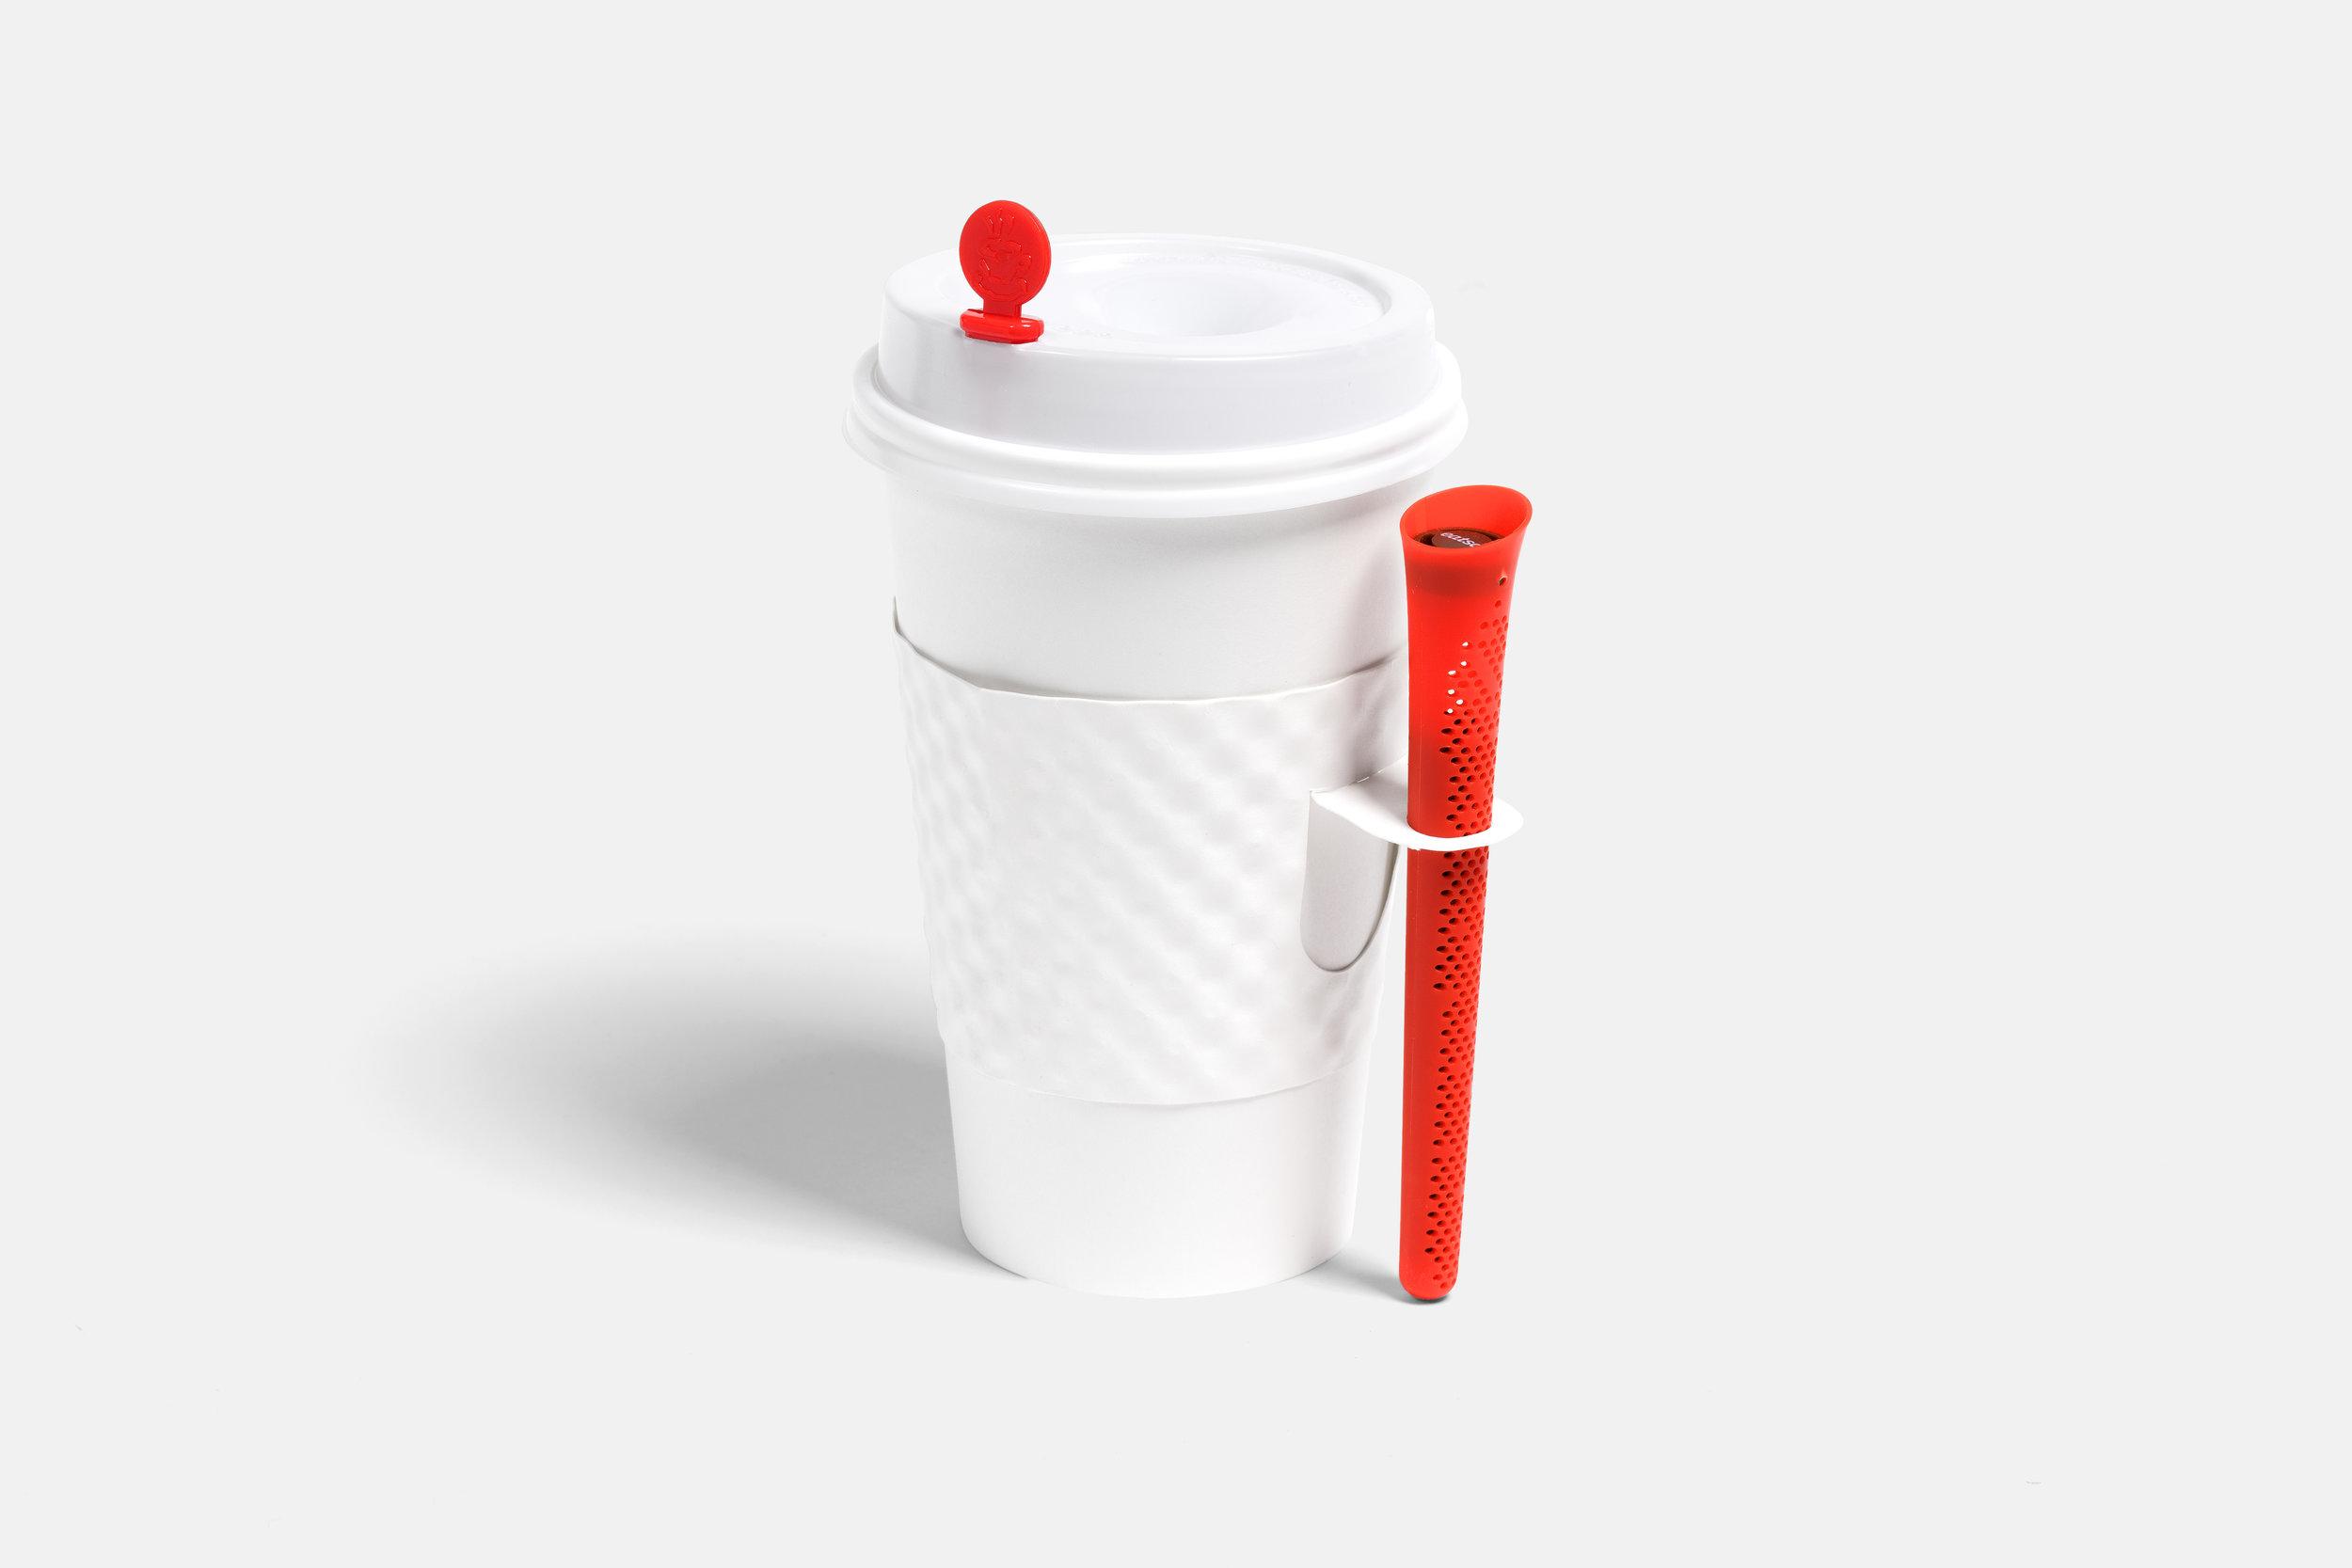 eatsa_coffee_cup_02.jpg